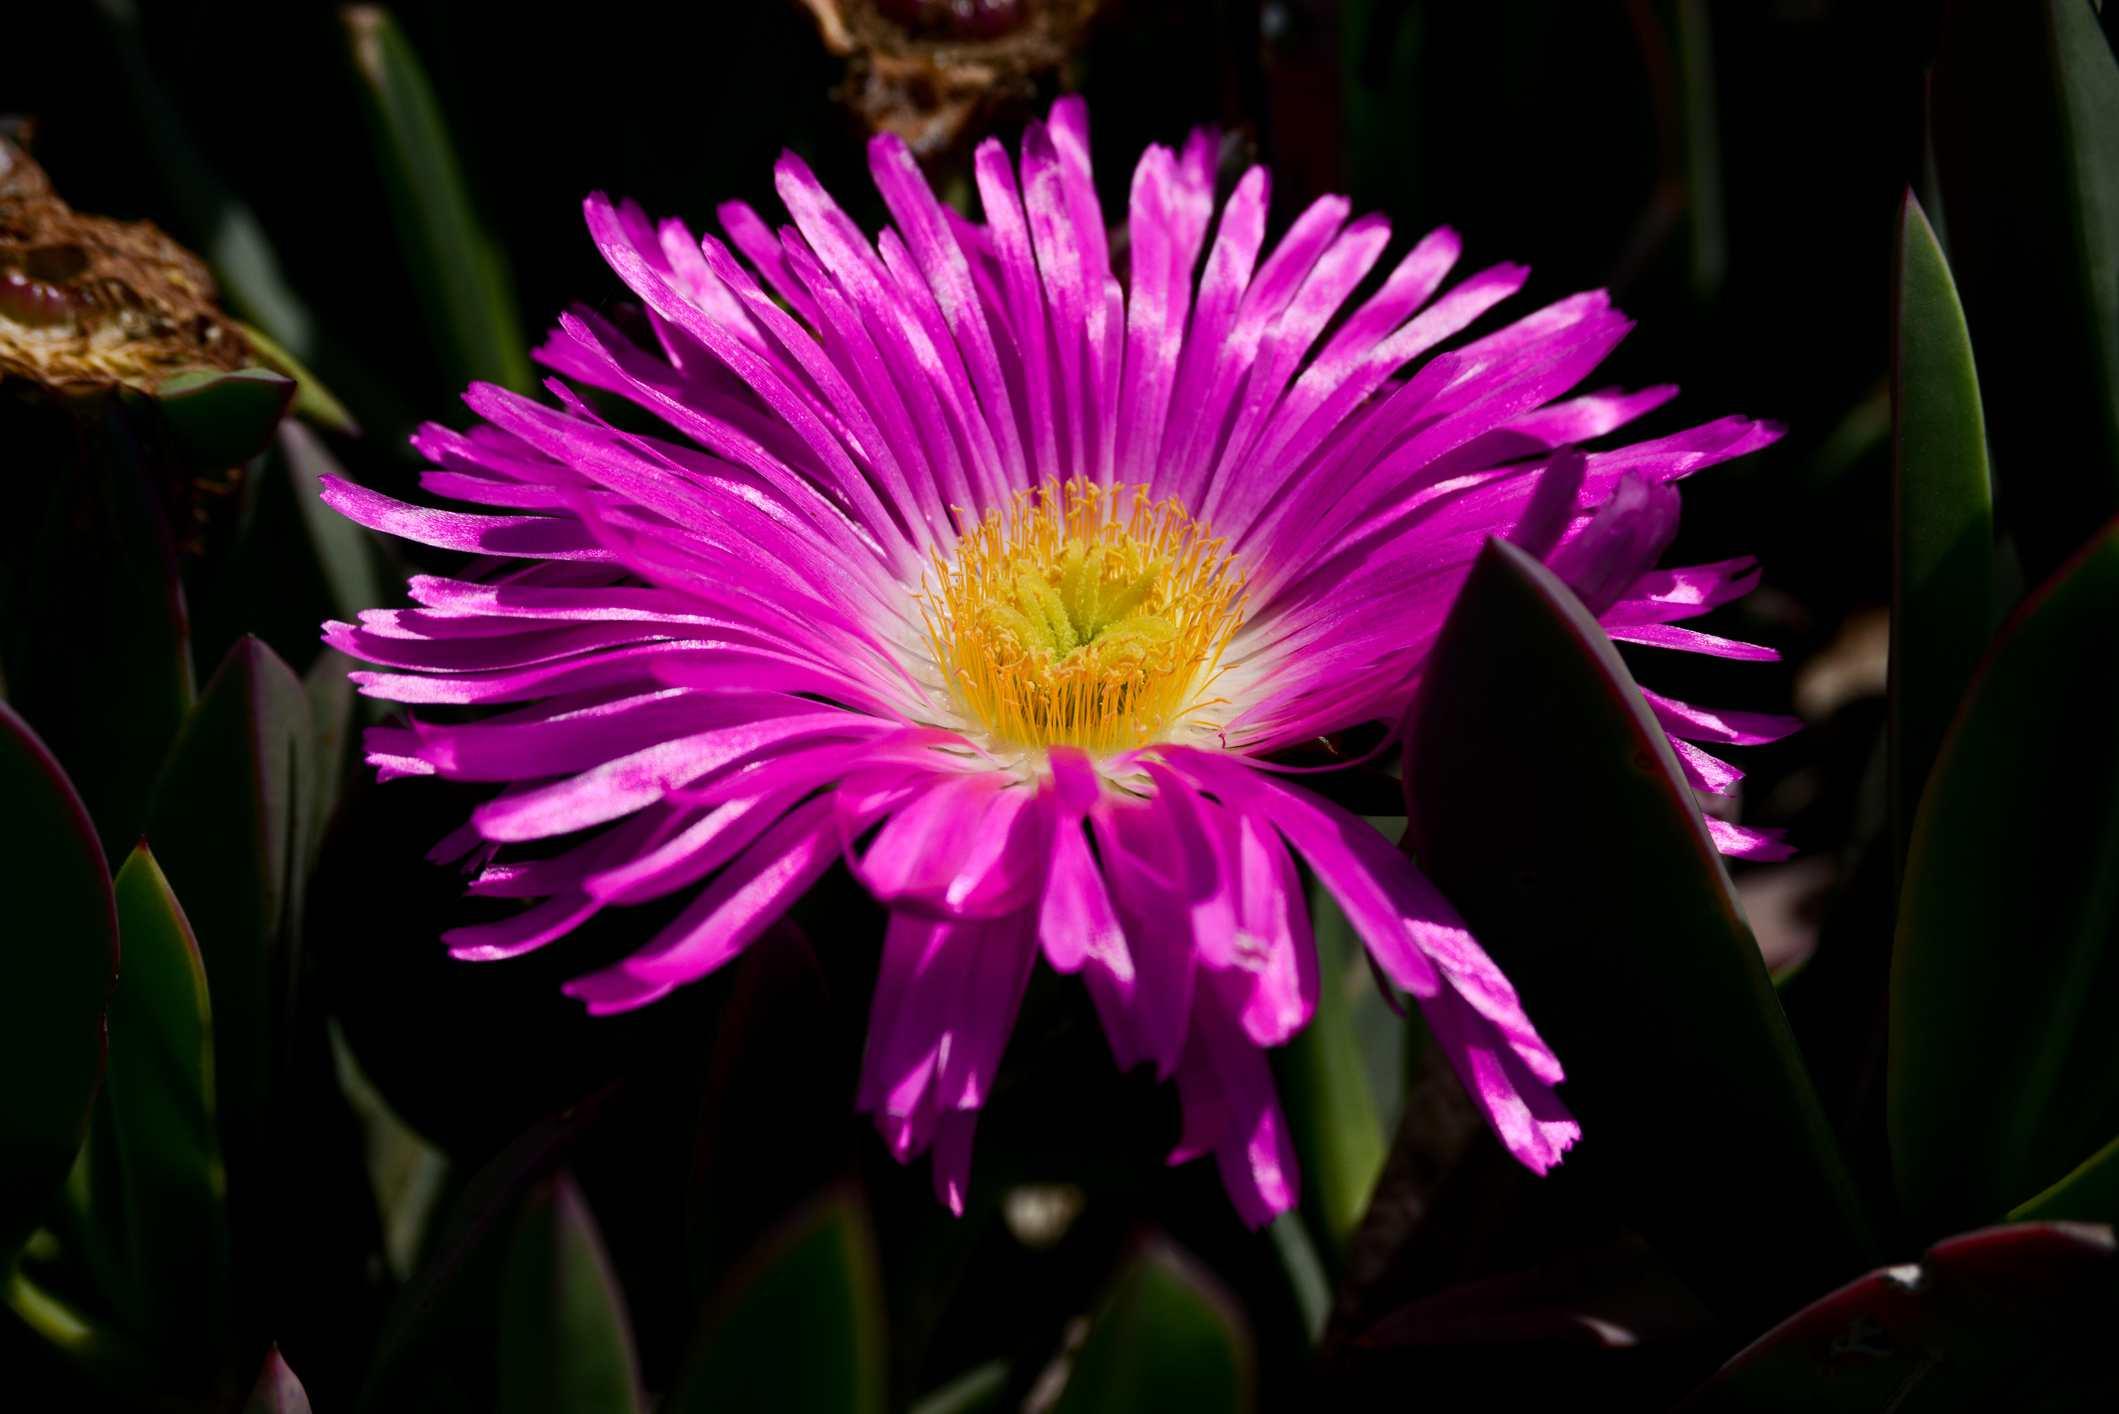 close-up of purple ice plant